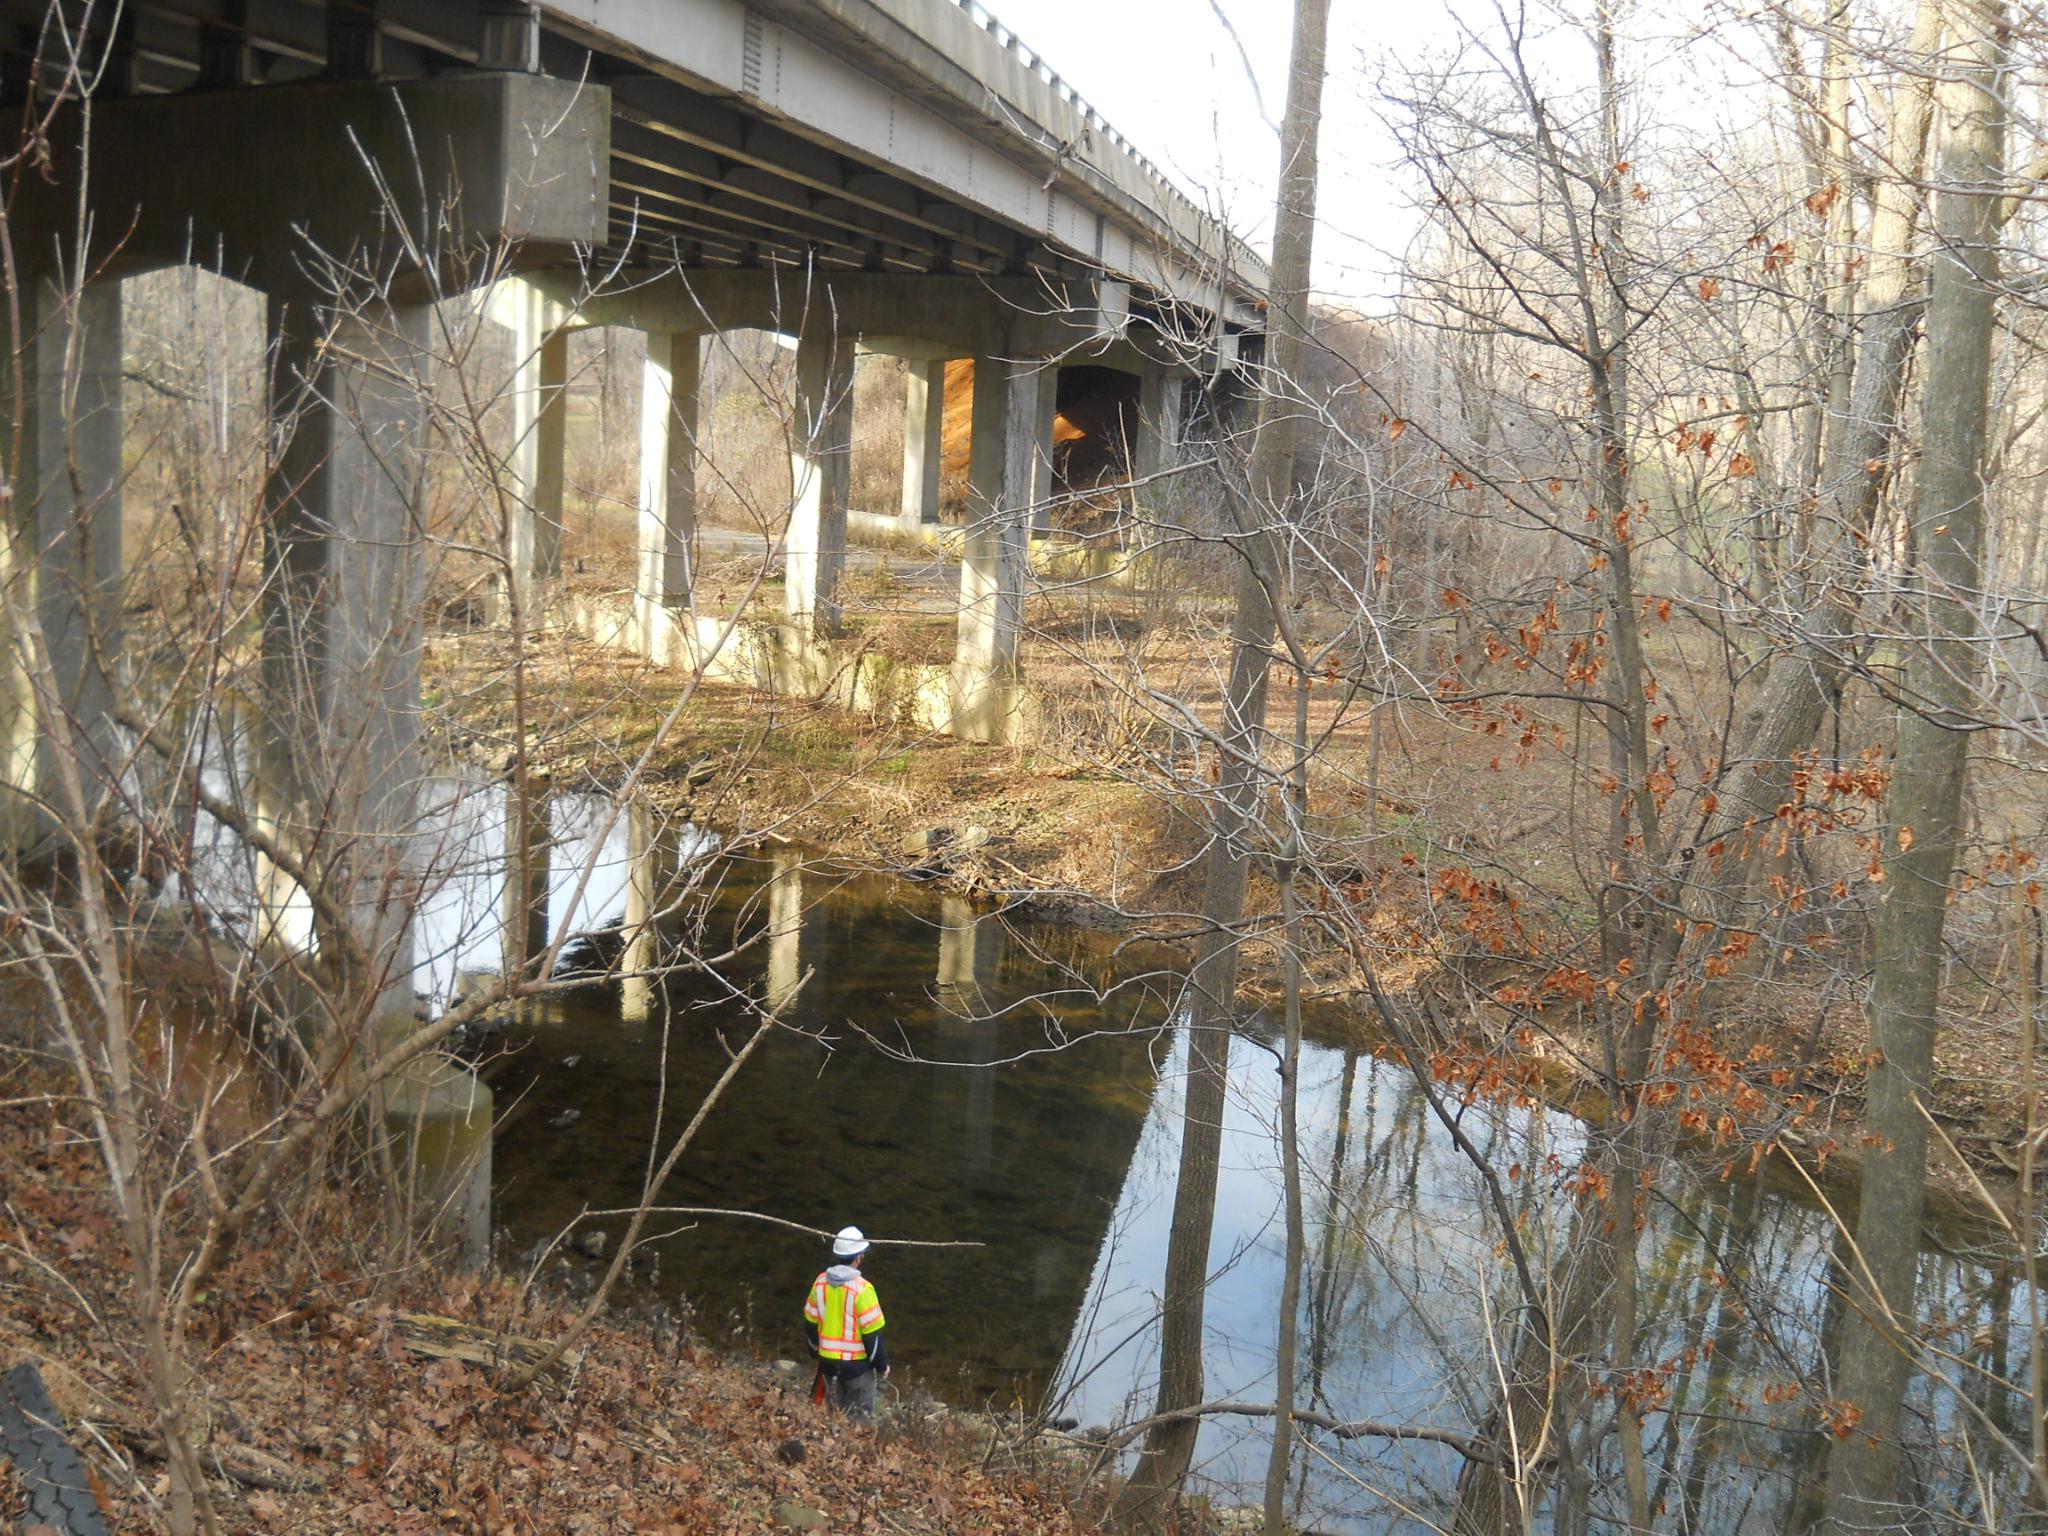 DSCN2809 looking north, PTK bridge over Little Lehigh.JPG